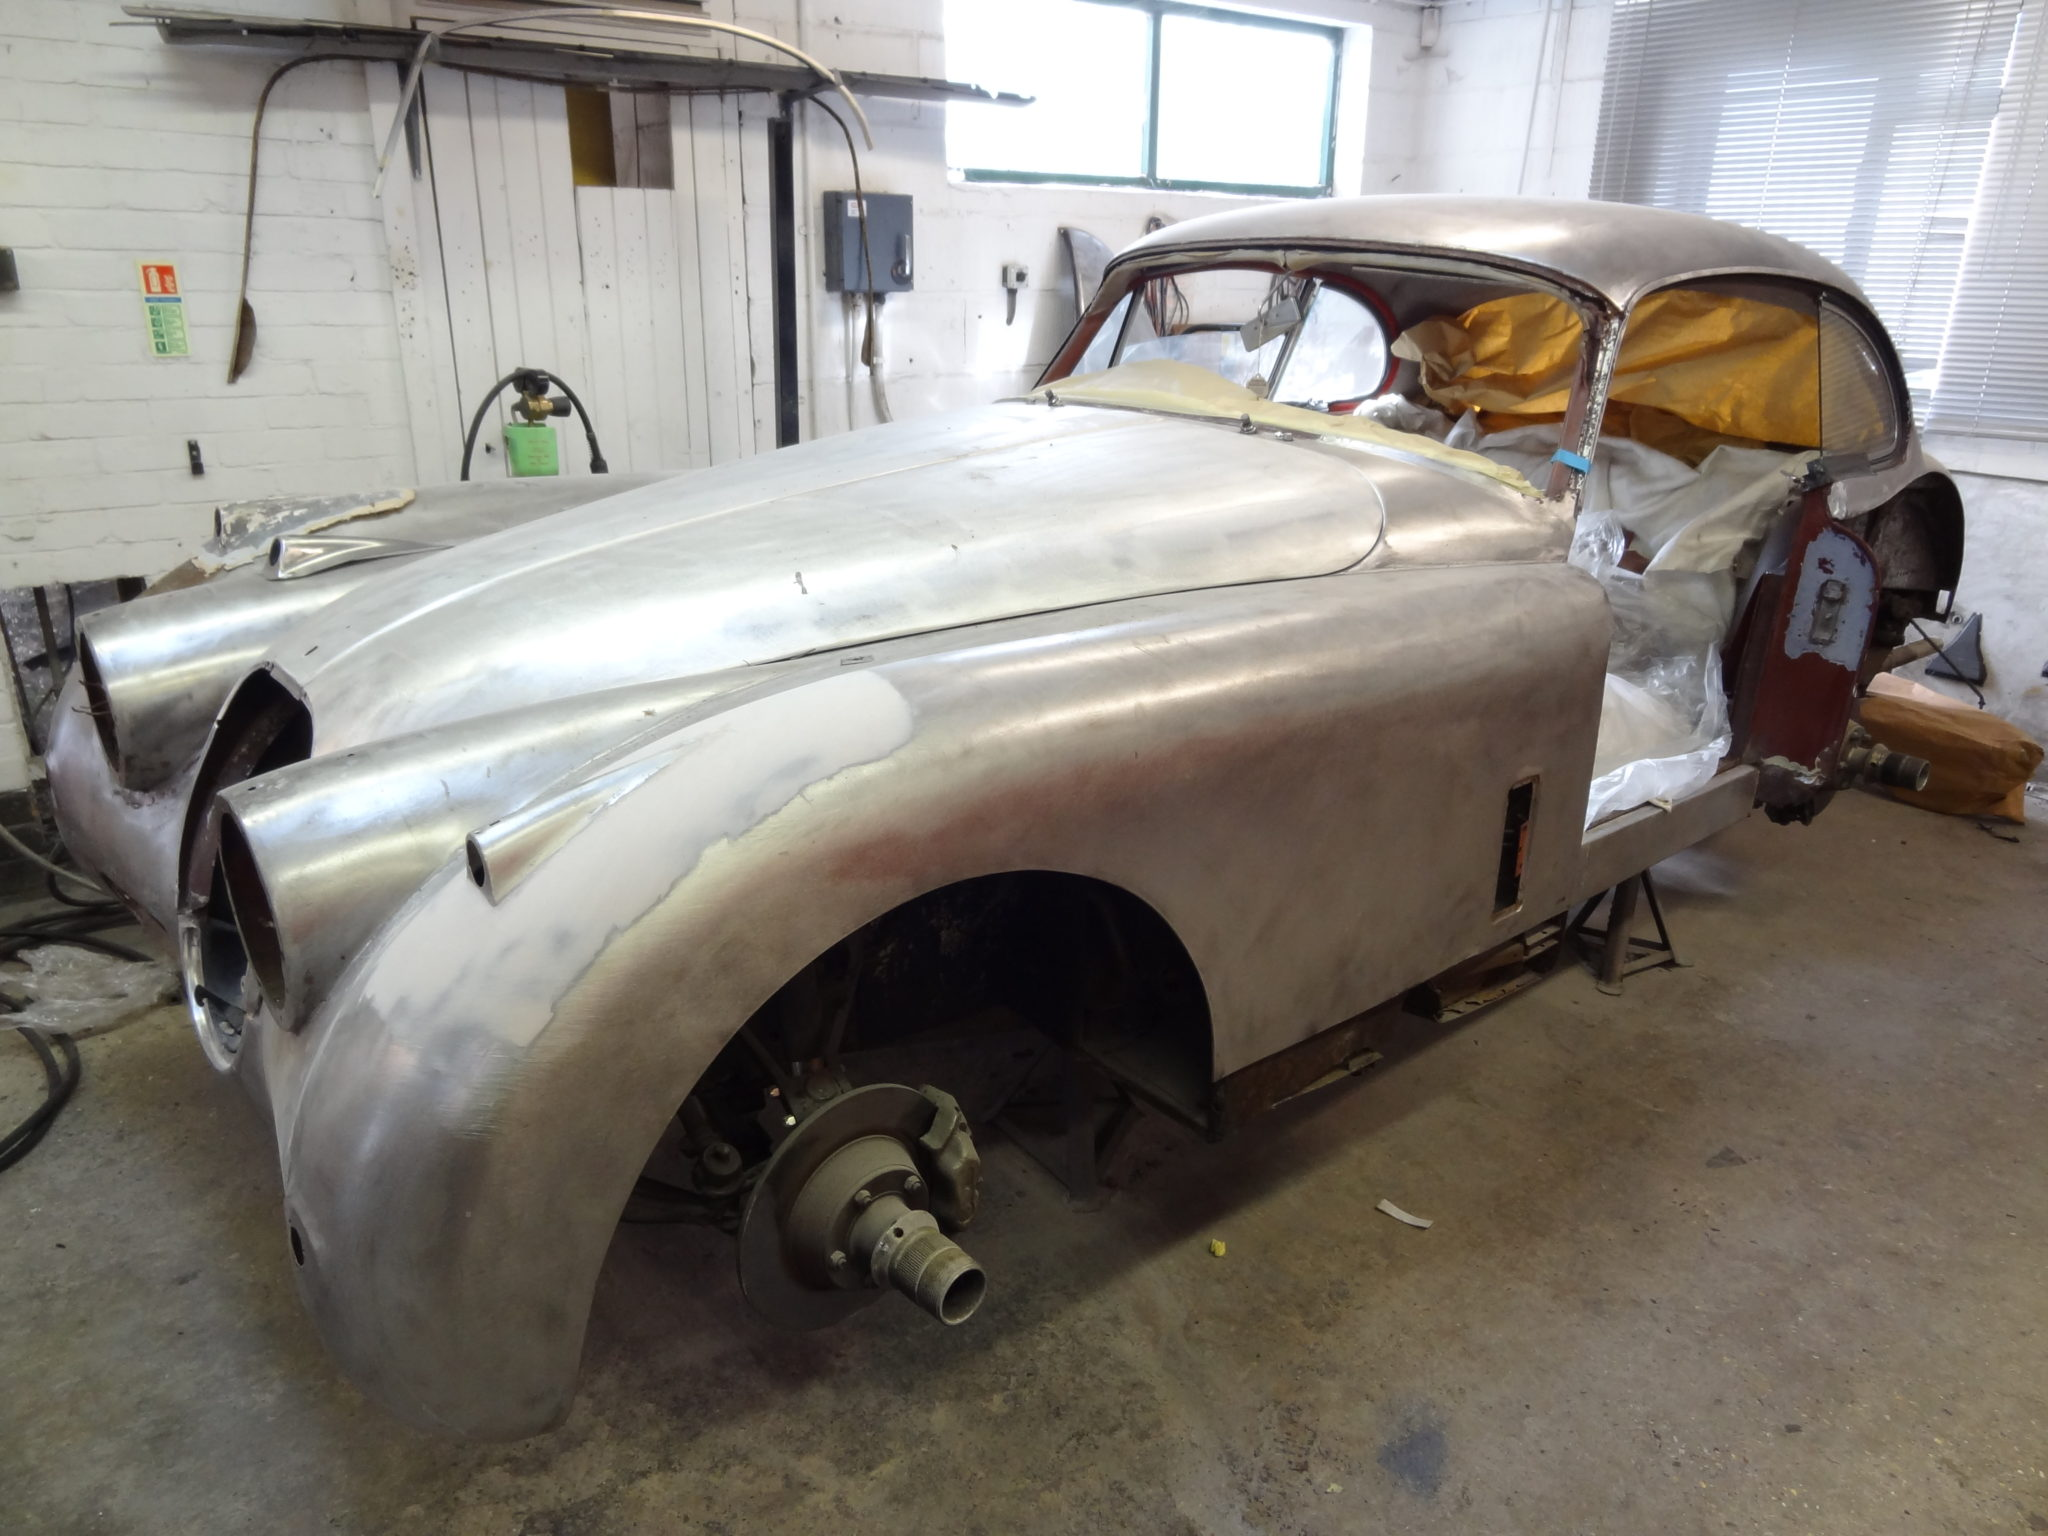 Beaconsfield Workshop - Rolls-Royce Restoration Specialists. Rolls-Royce restored for the Emir of Kano